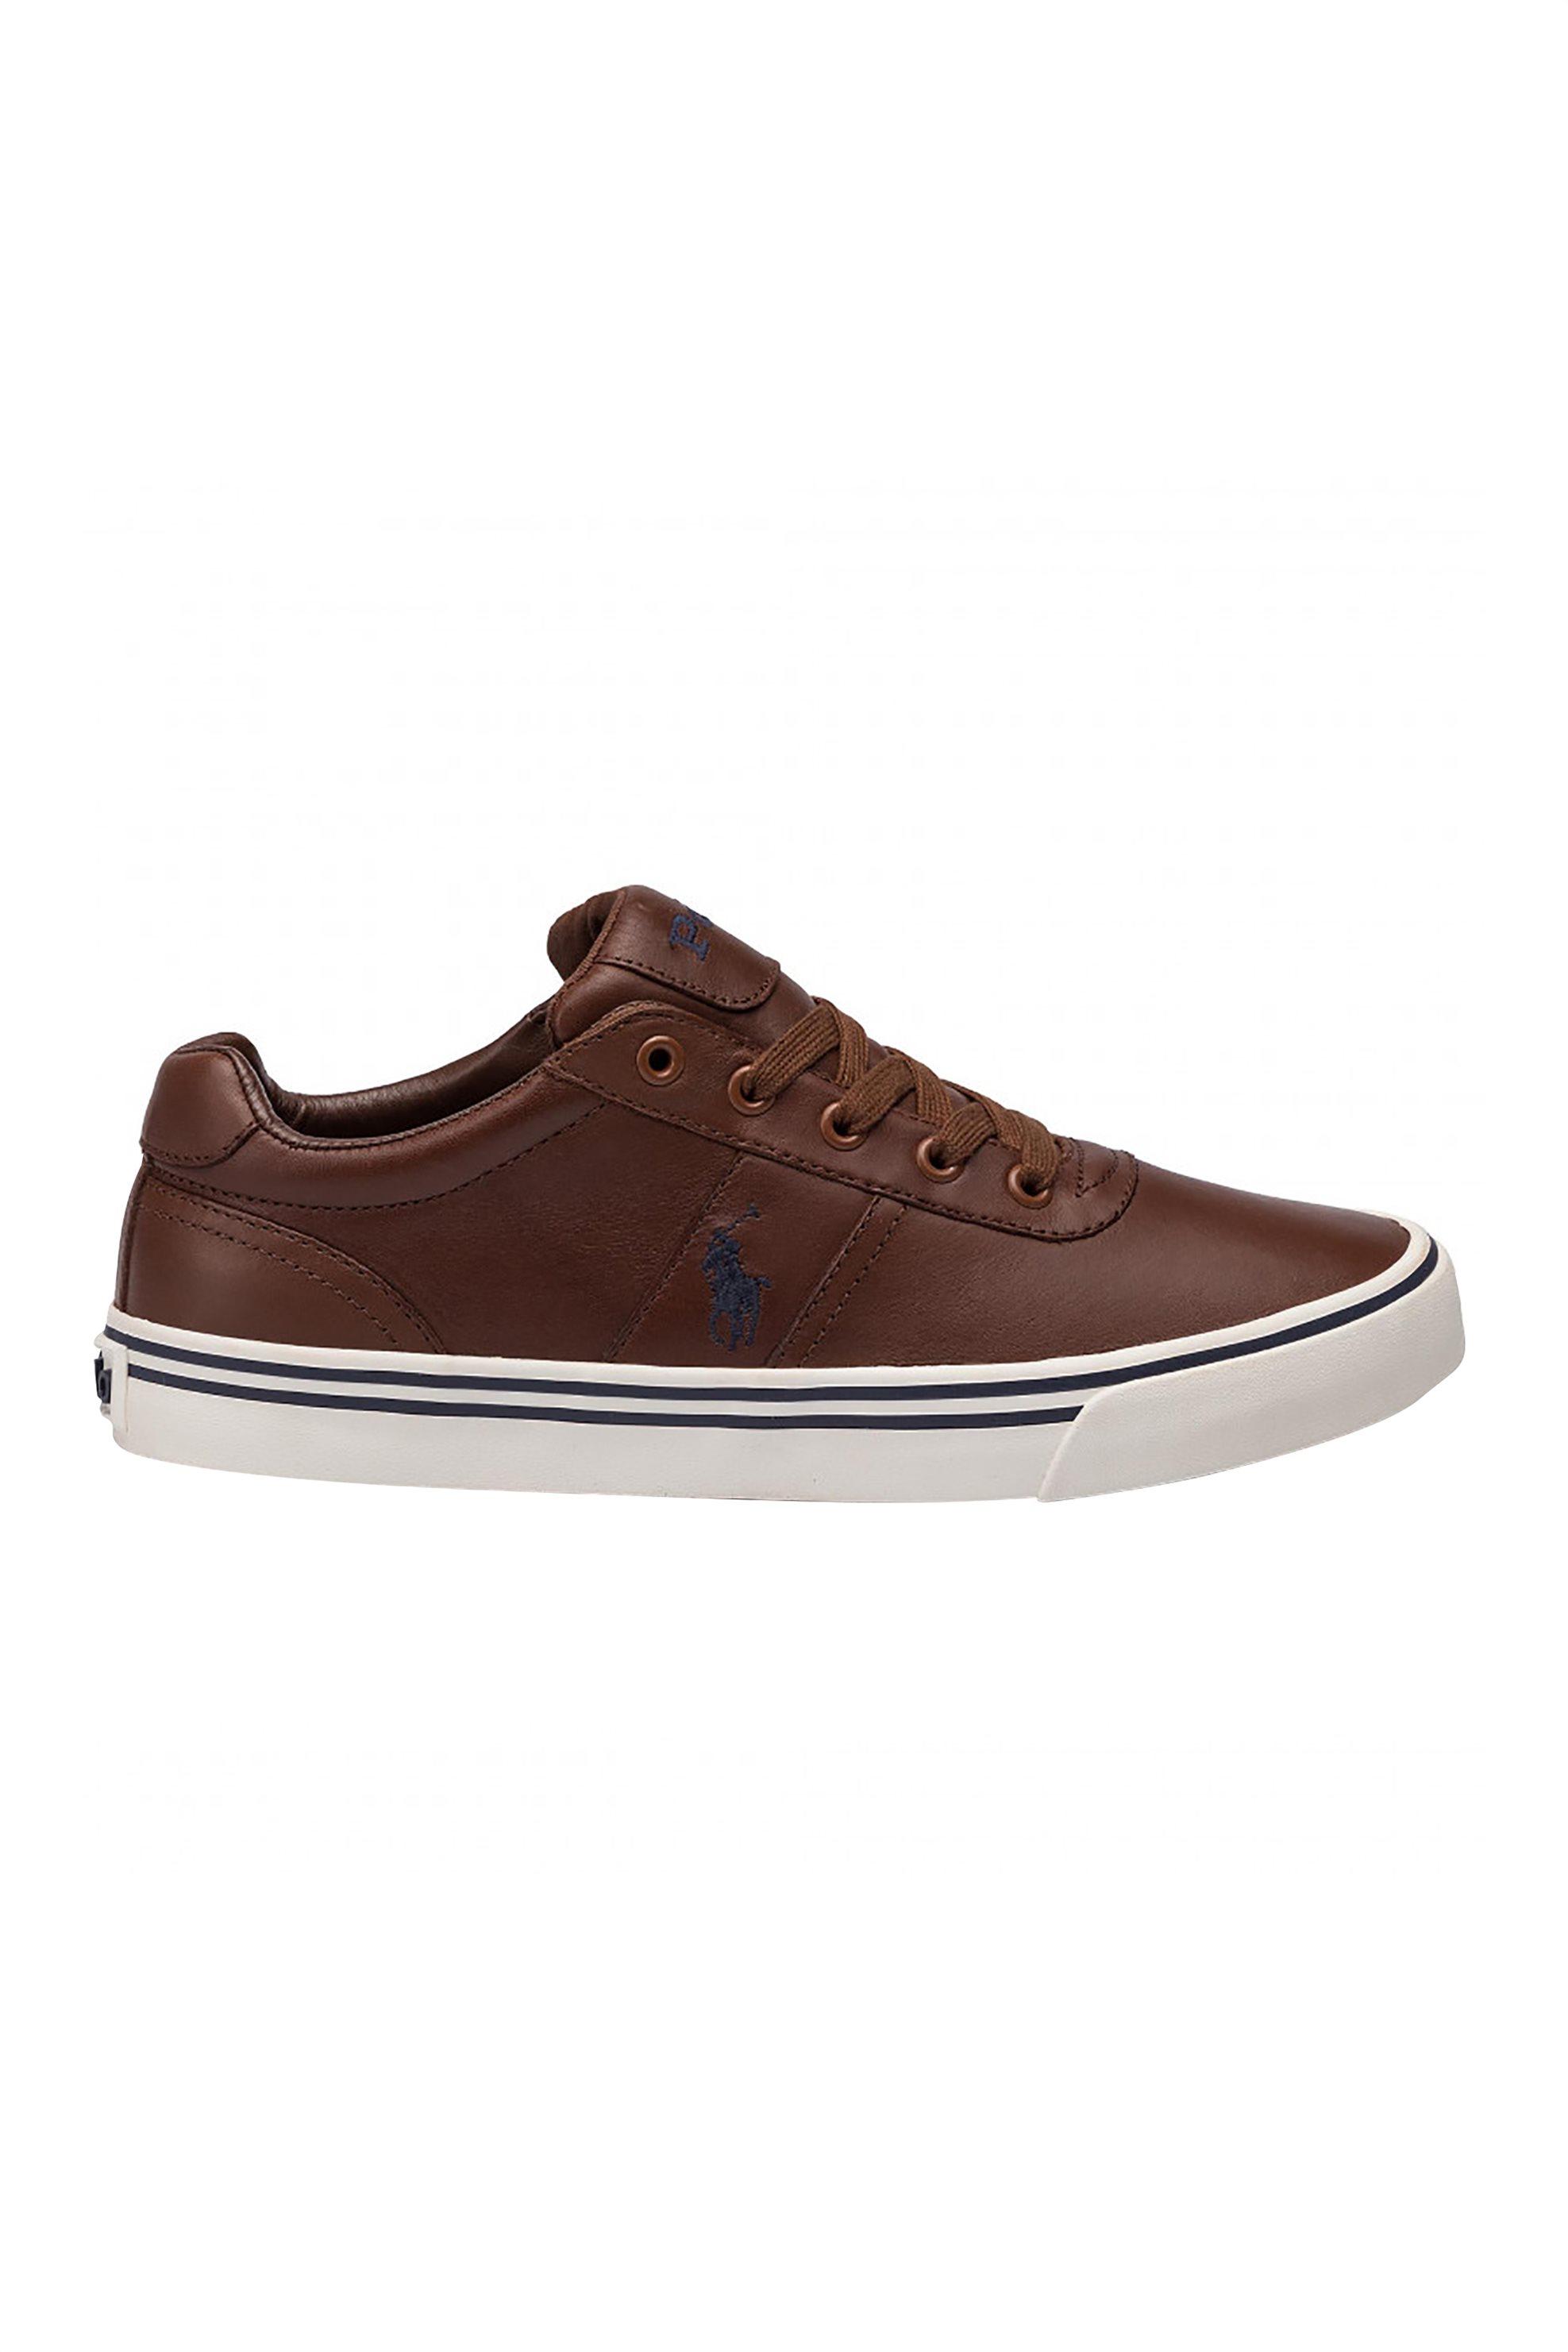 Polo Ralph Lauren ανδρικά δερμάτινα sneakers – 816765046004 – Καφέ